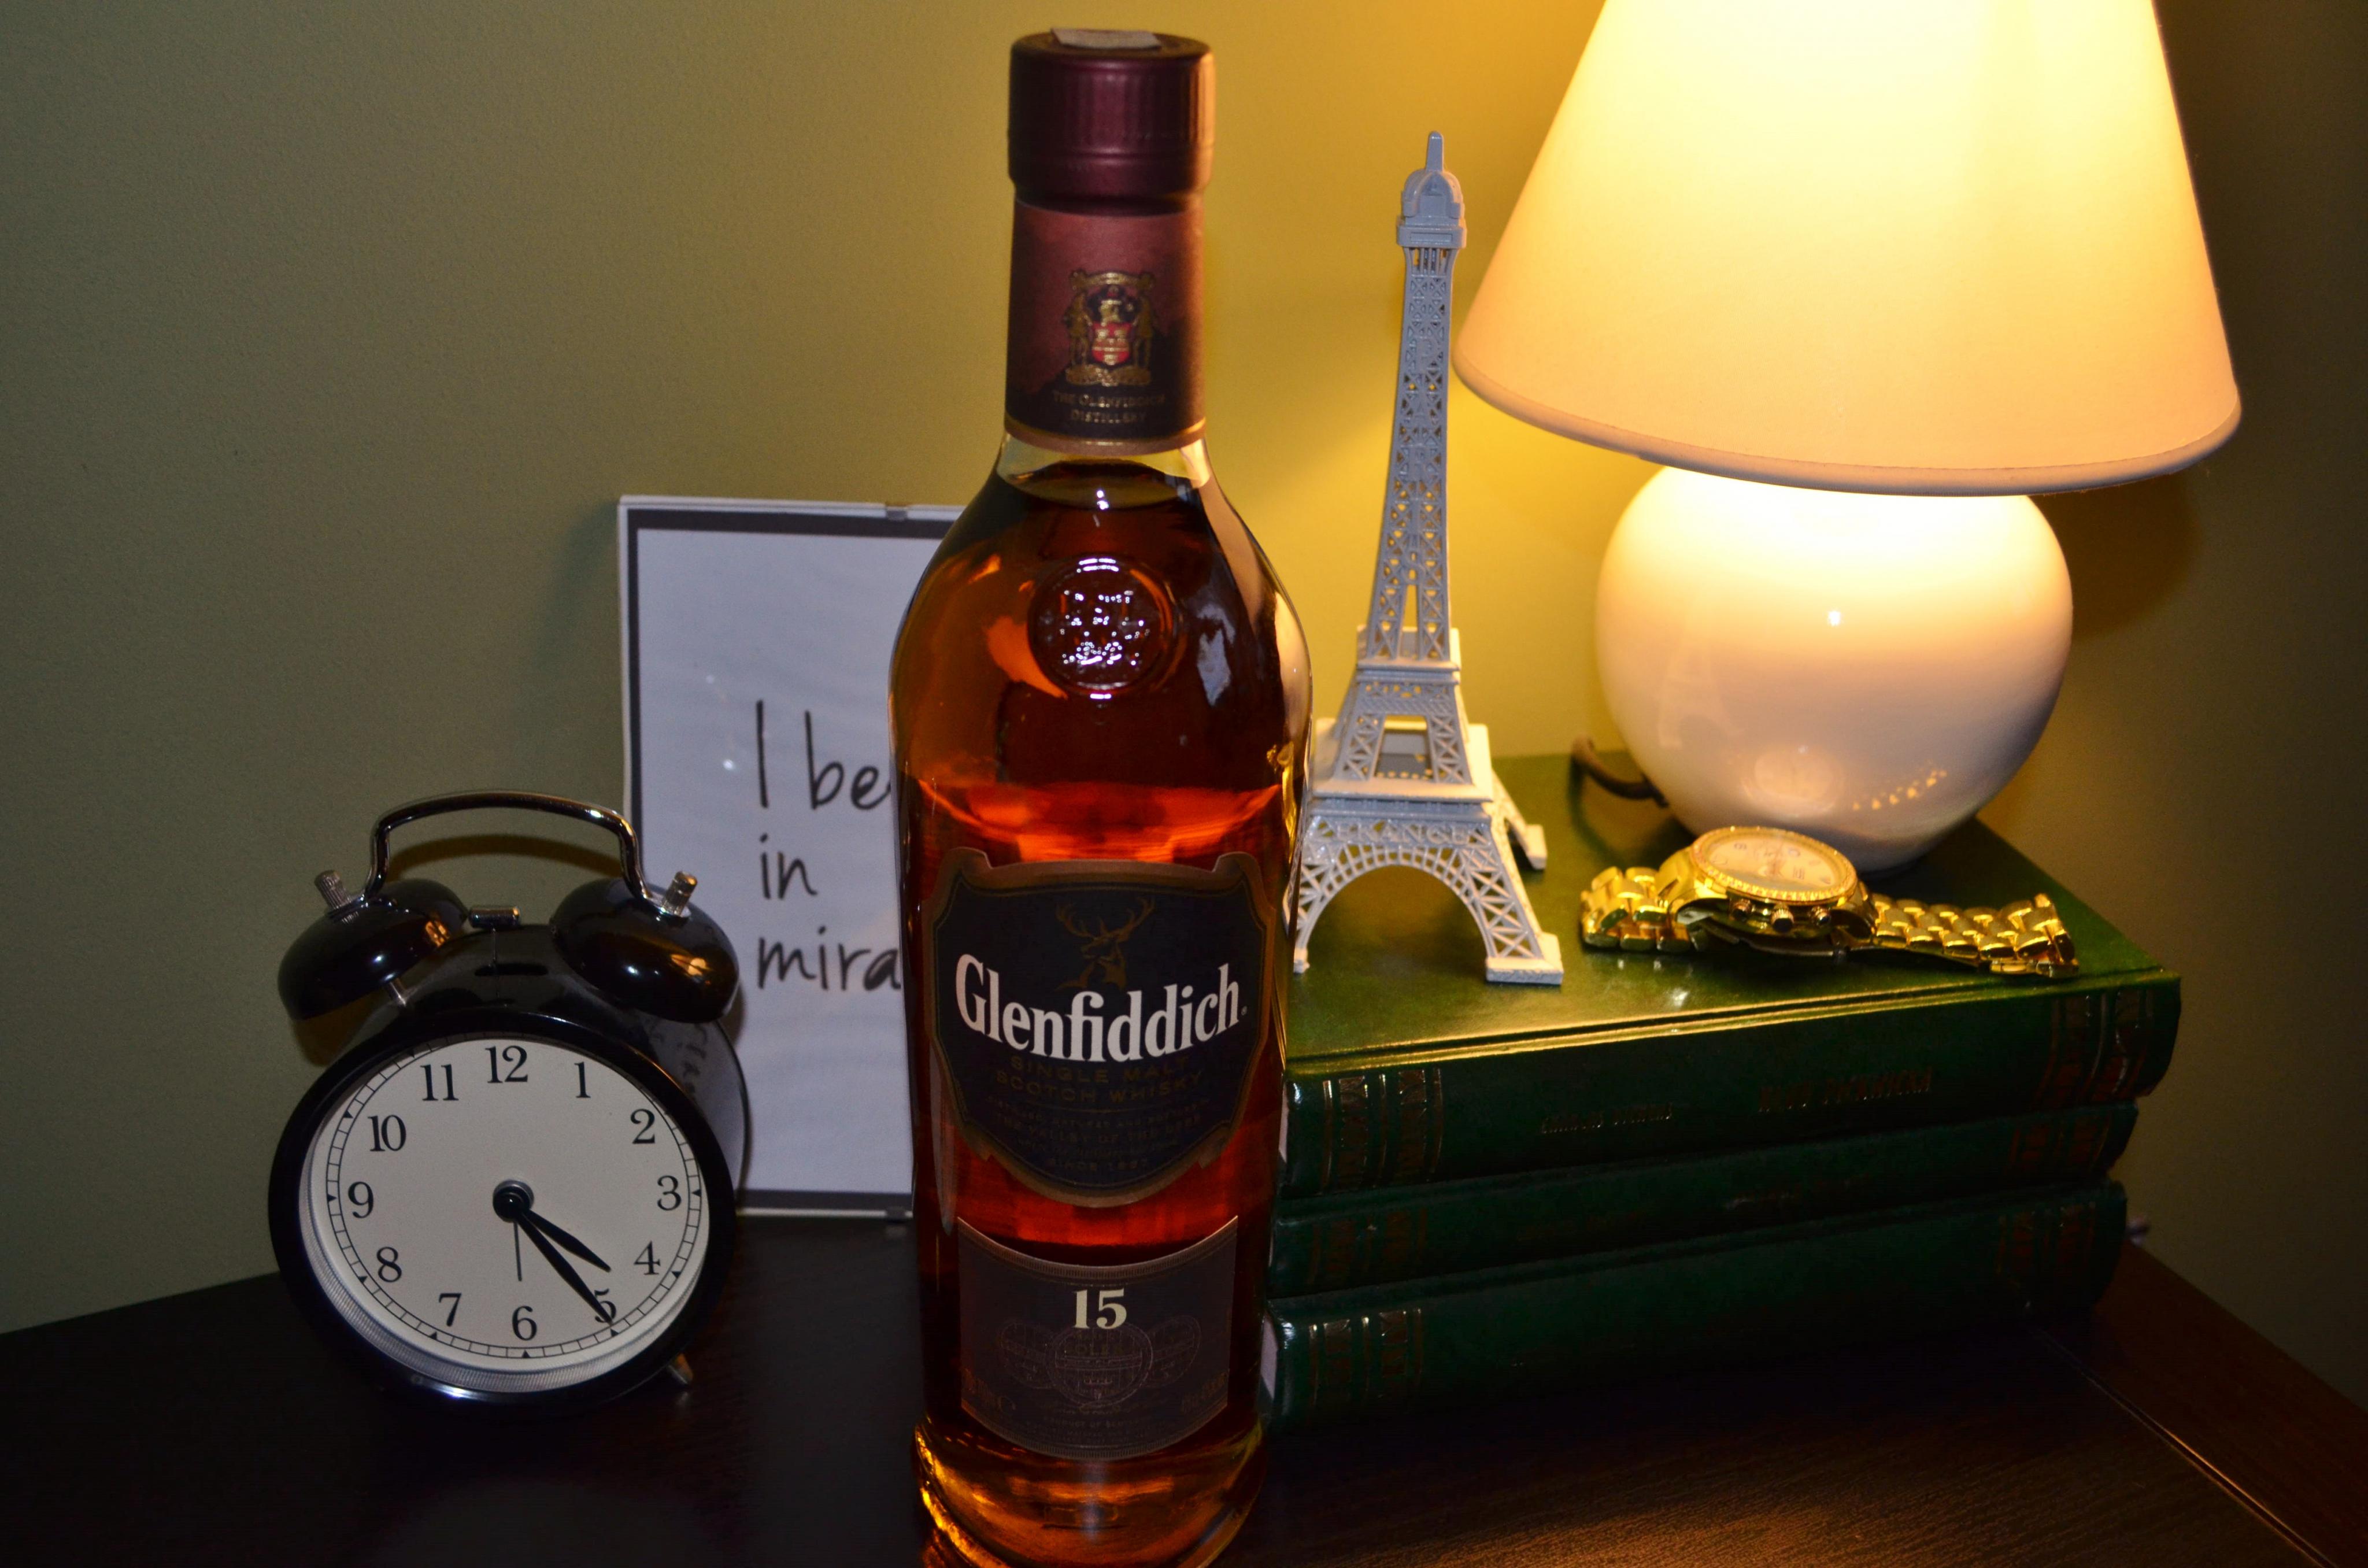 Poznajmy whisky ? Glenfiddich 15 Yo!